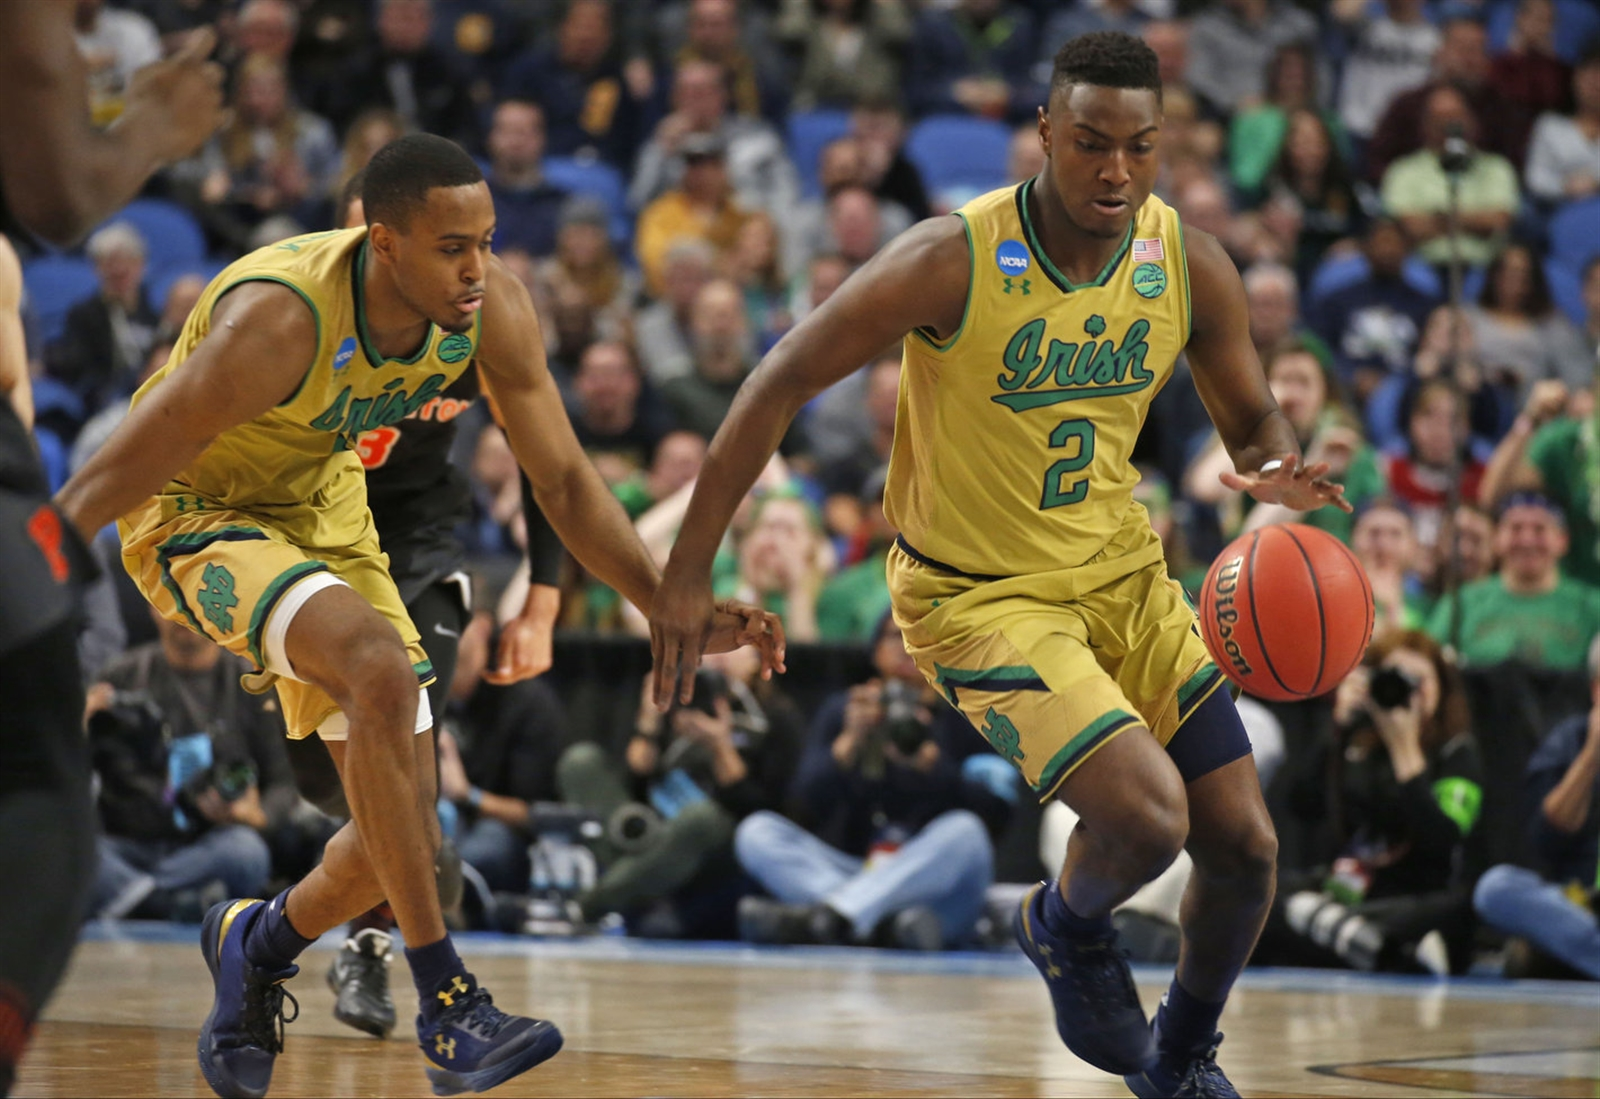 T.J. Gibbs (2), V.J. Beachem and Notre Dame will need to take care of the ball against West Virginia. (Robert Kirkham/Buffalo News)